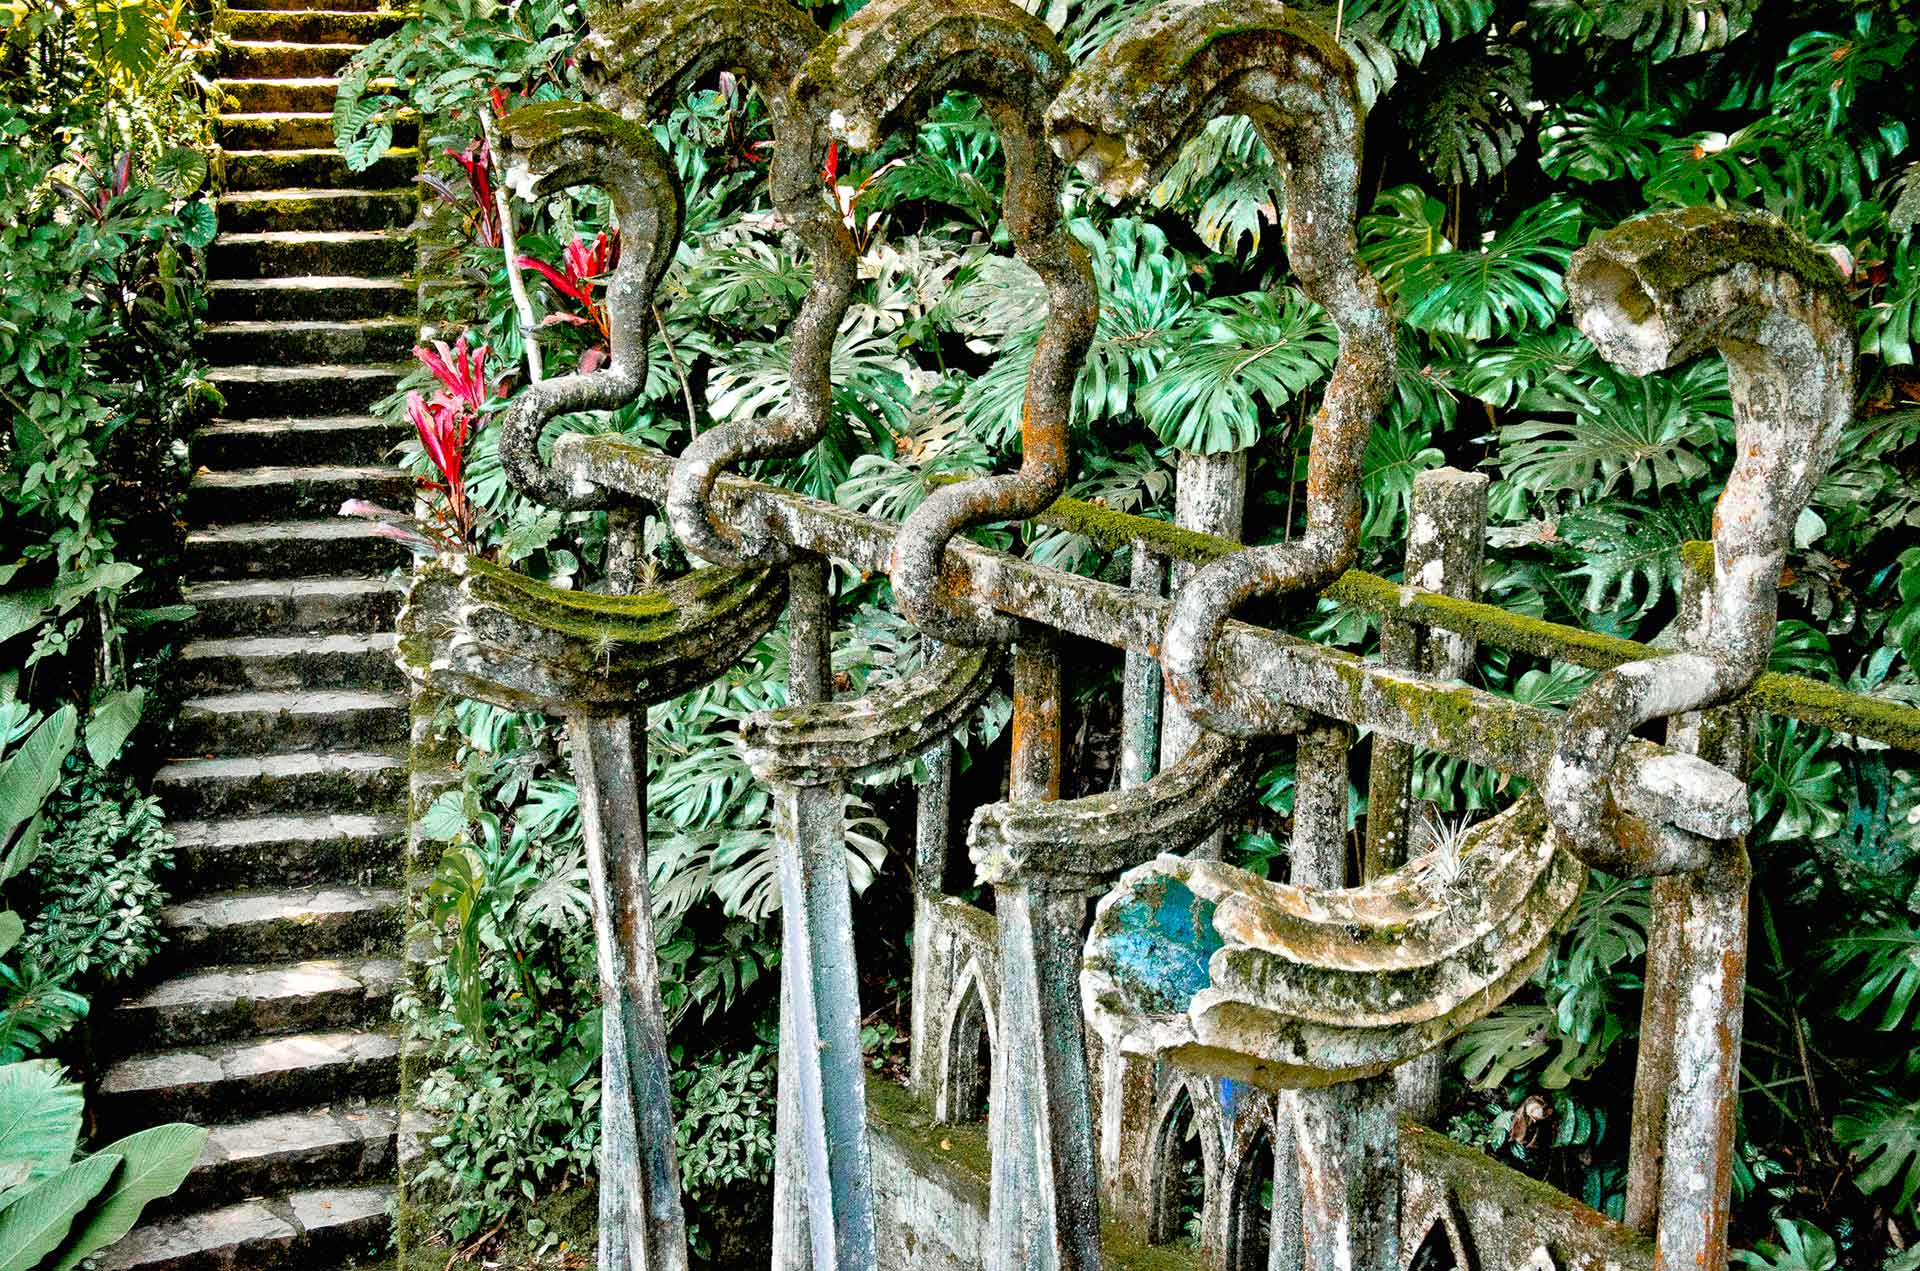 Jardin de edward James en xilitla